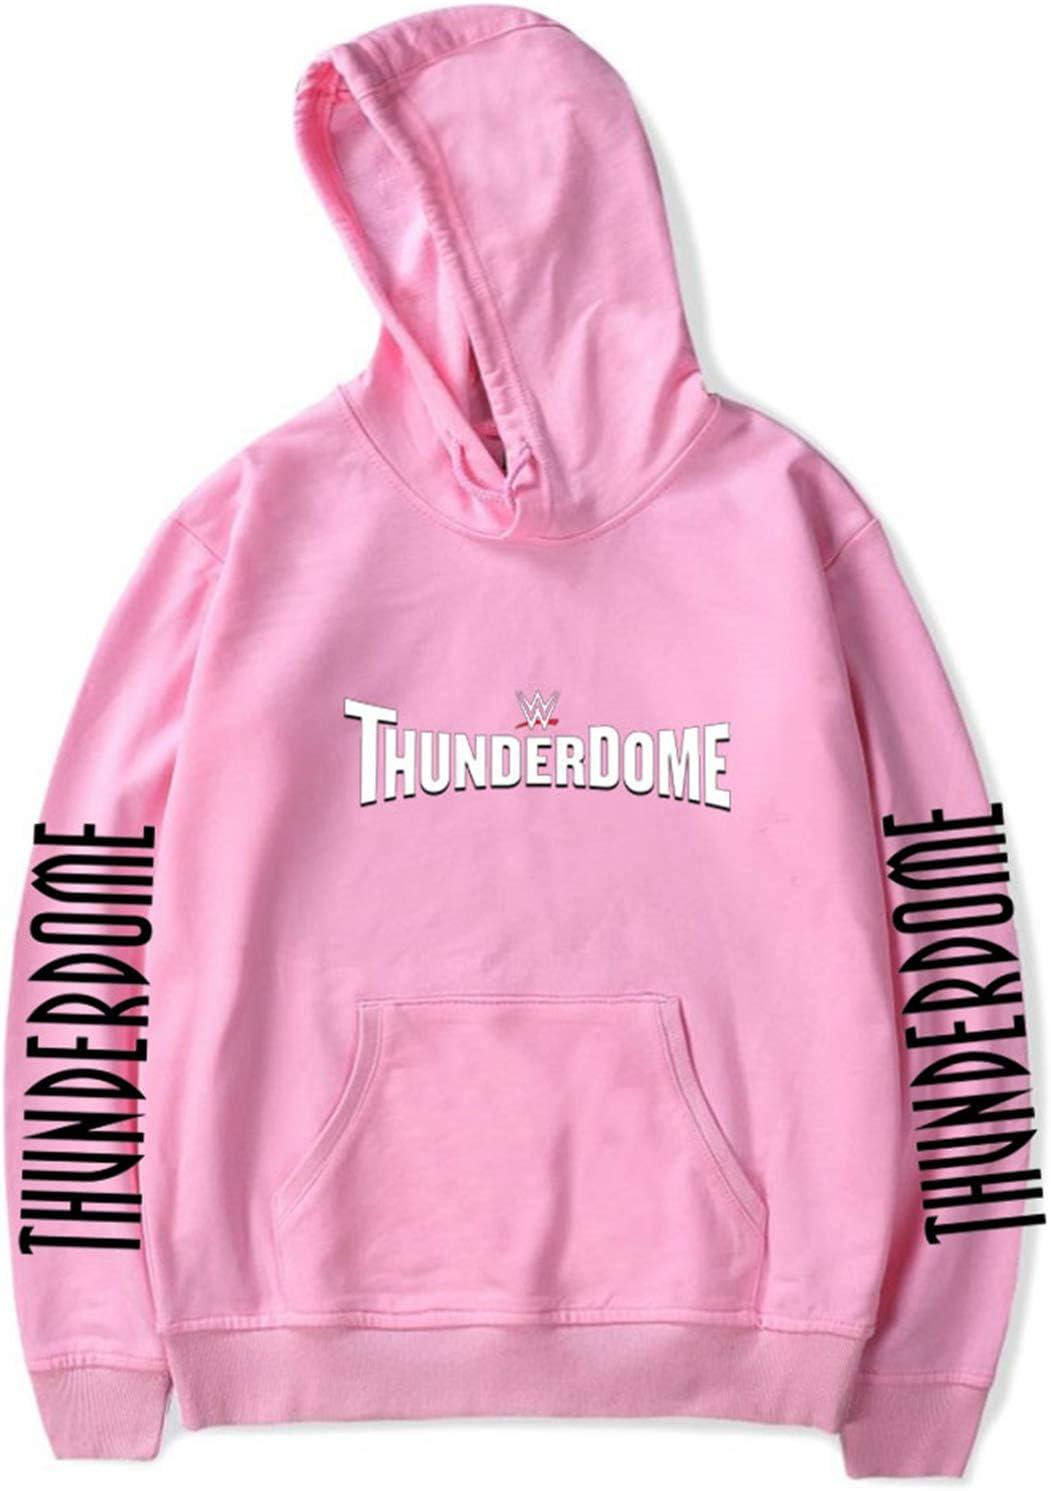 2XS-3XL CAFINI Sudadera con Capucha con Estampado de Texto Thunderdome Cool Sudadera Unisex Shin Harajuku Streetwear Sudadera Casual KPOP Hip-Hop Sweater